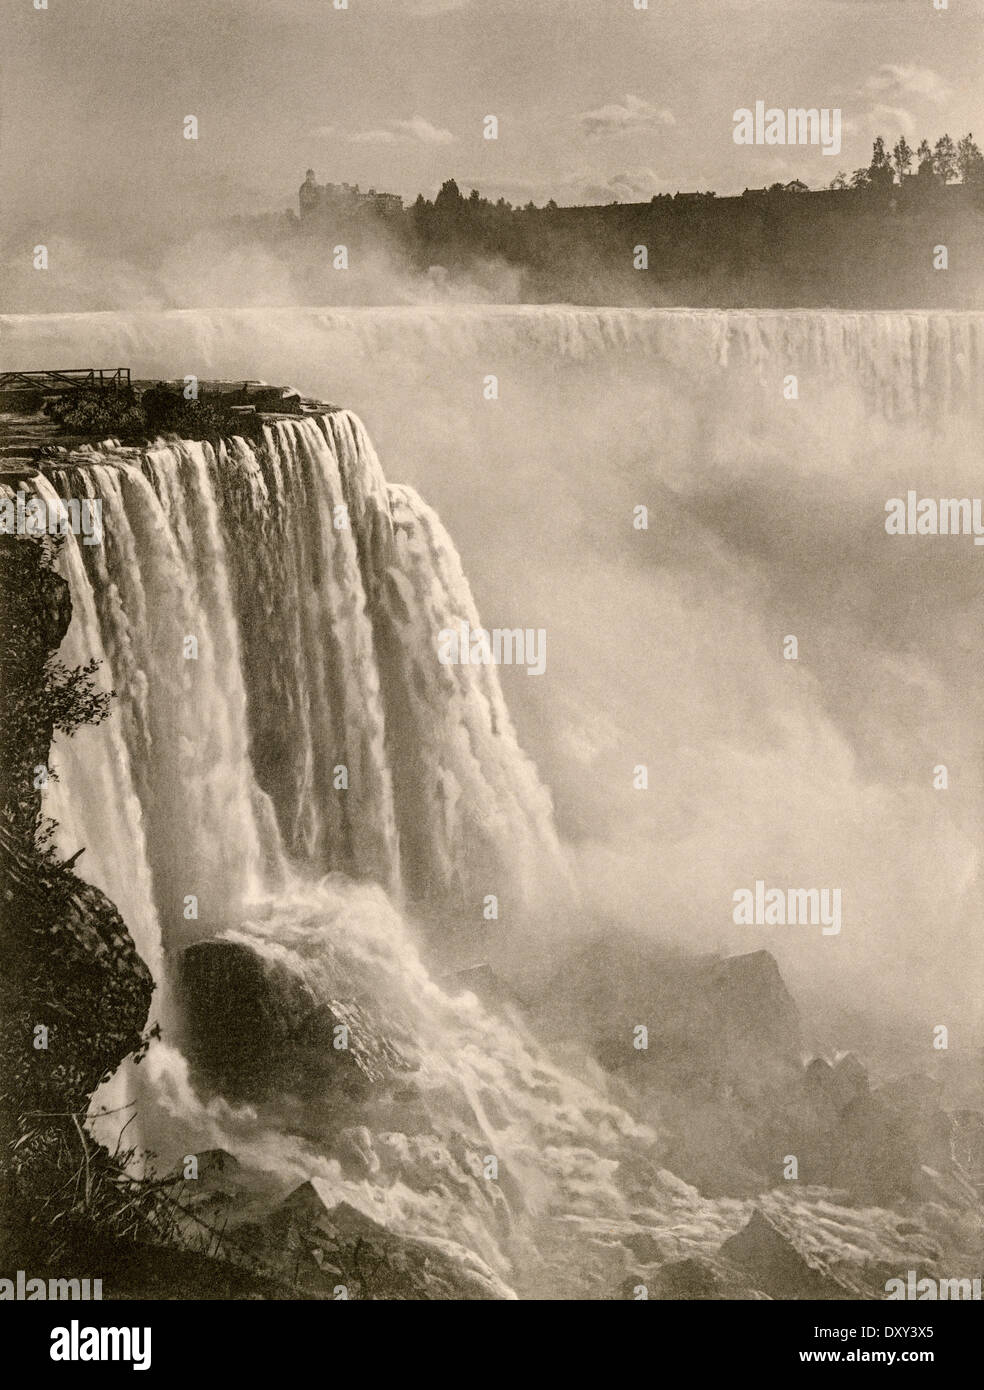 Horseshoe Falls, Teil von Niagara Falls, der 1890er Jahre. Stockbild